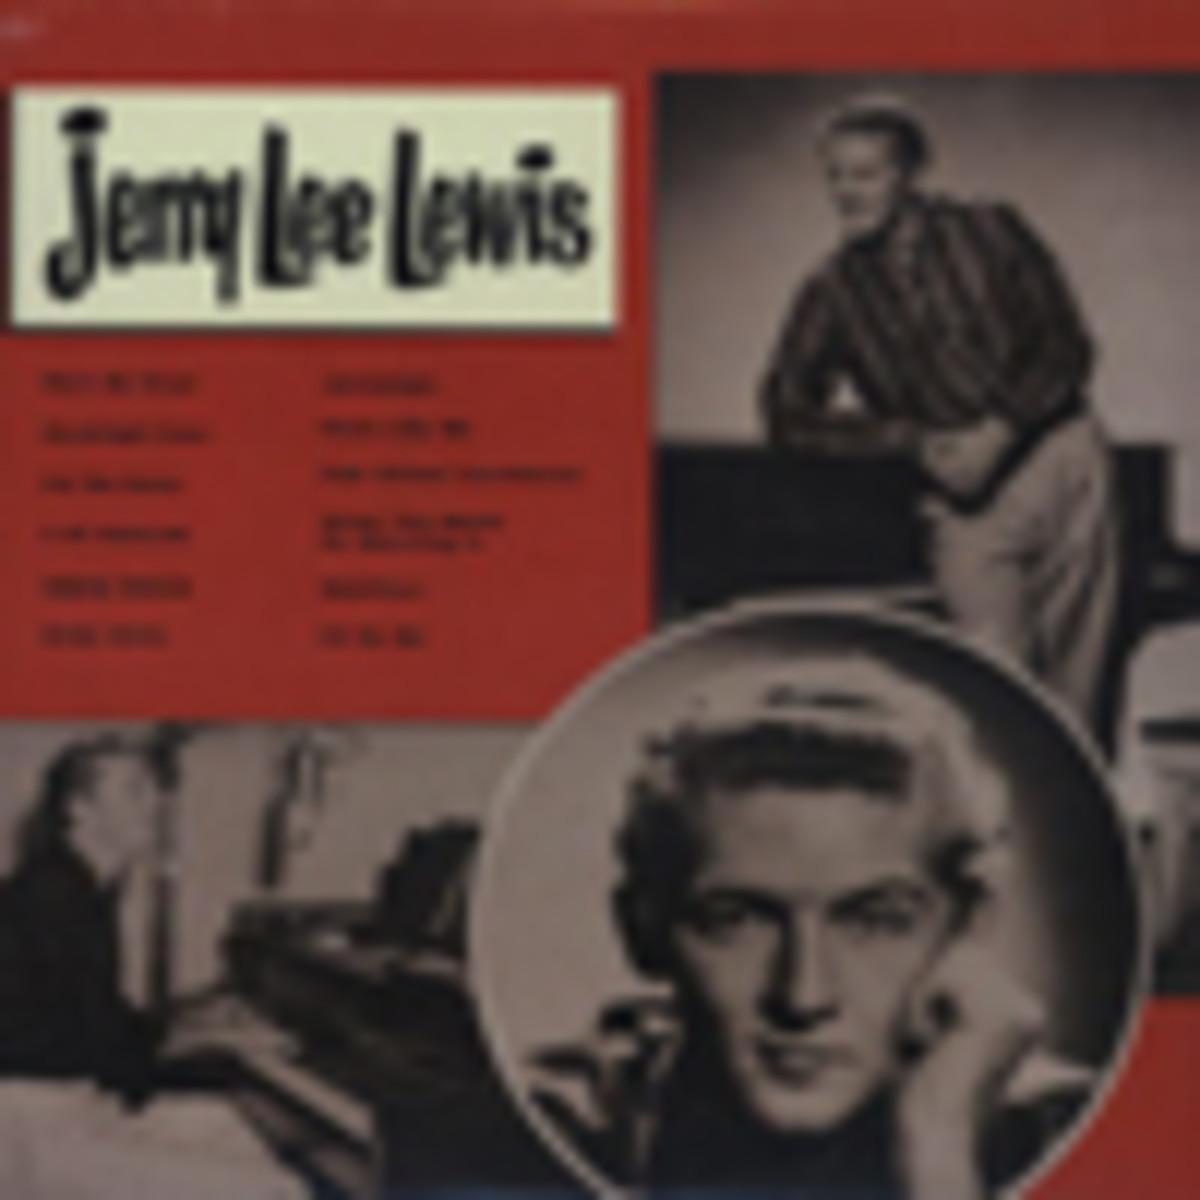 Jerry Lee Lewis eponymous debut album